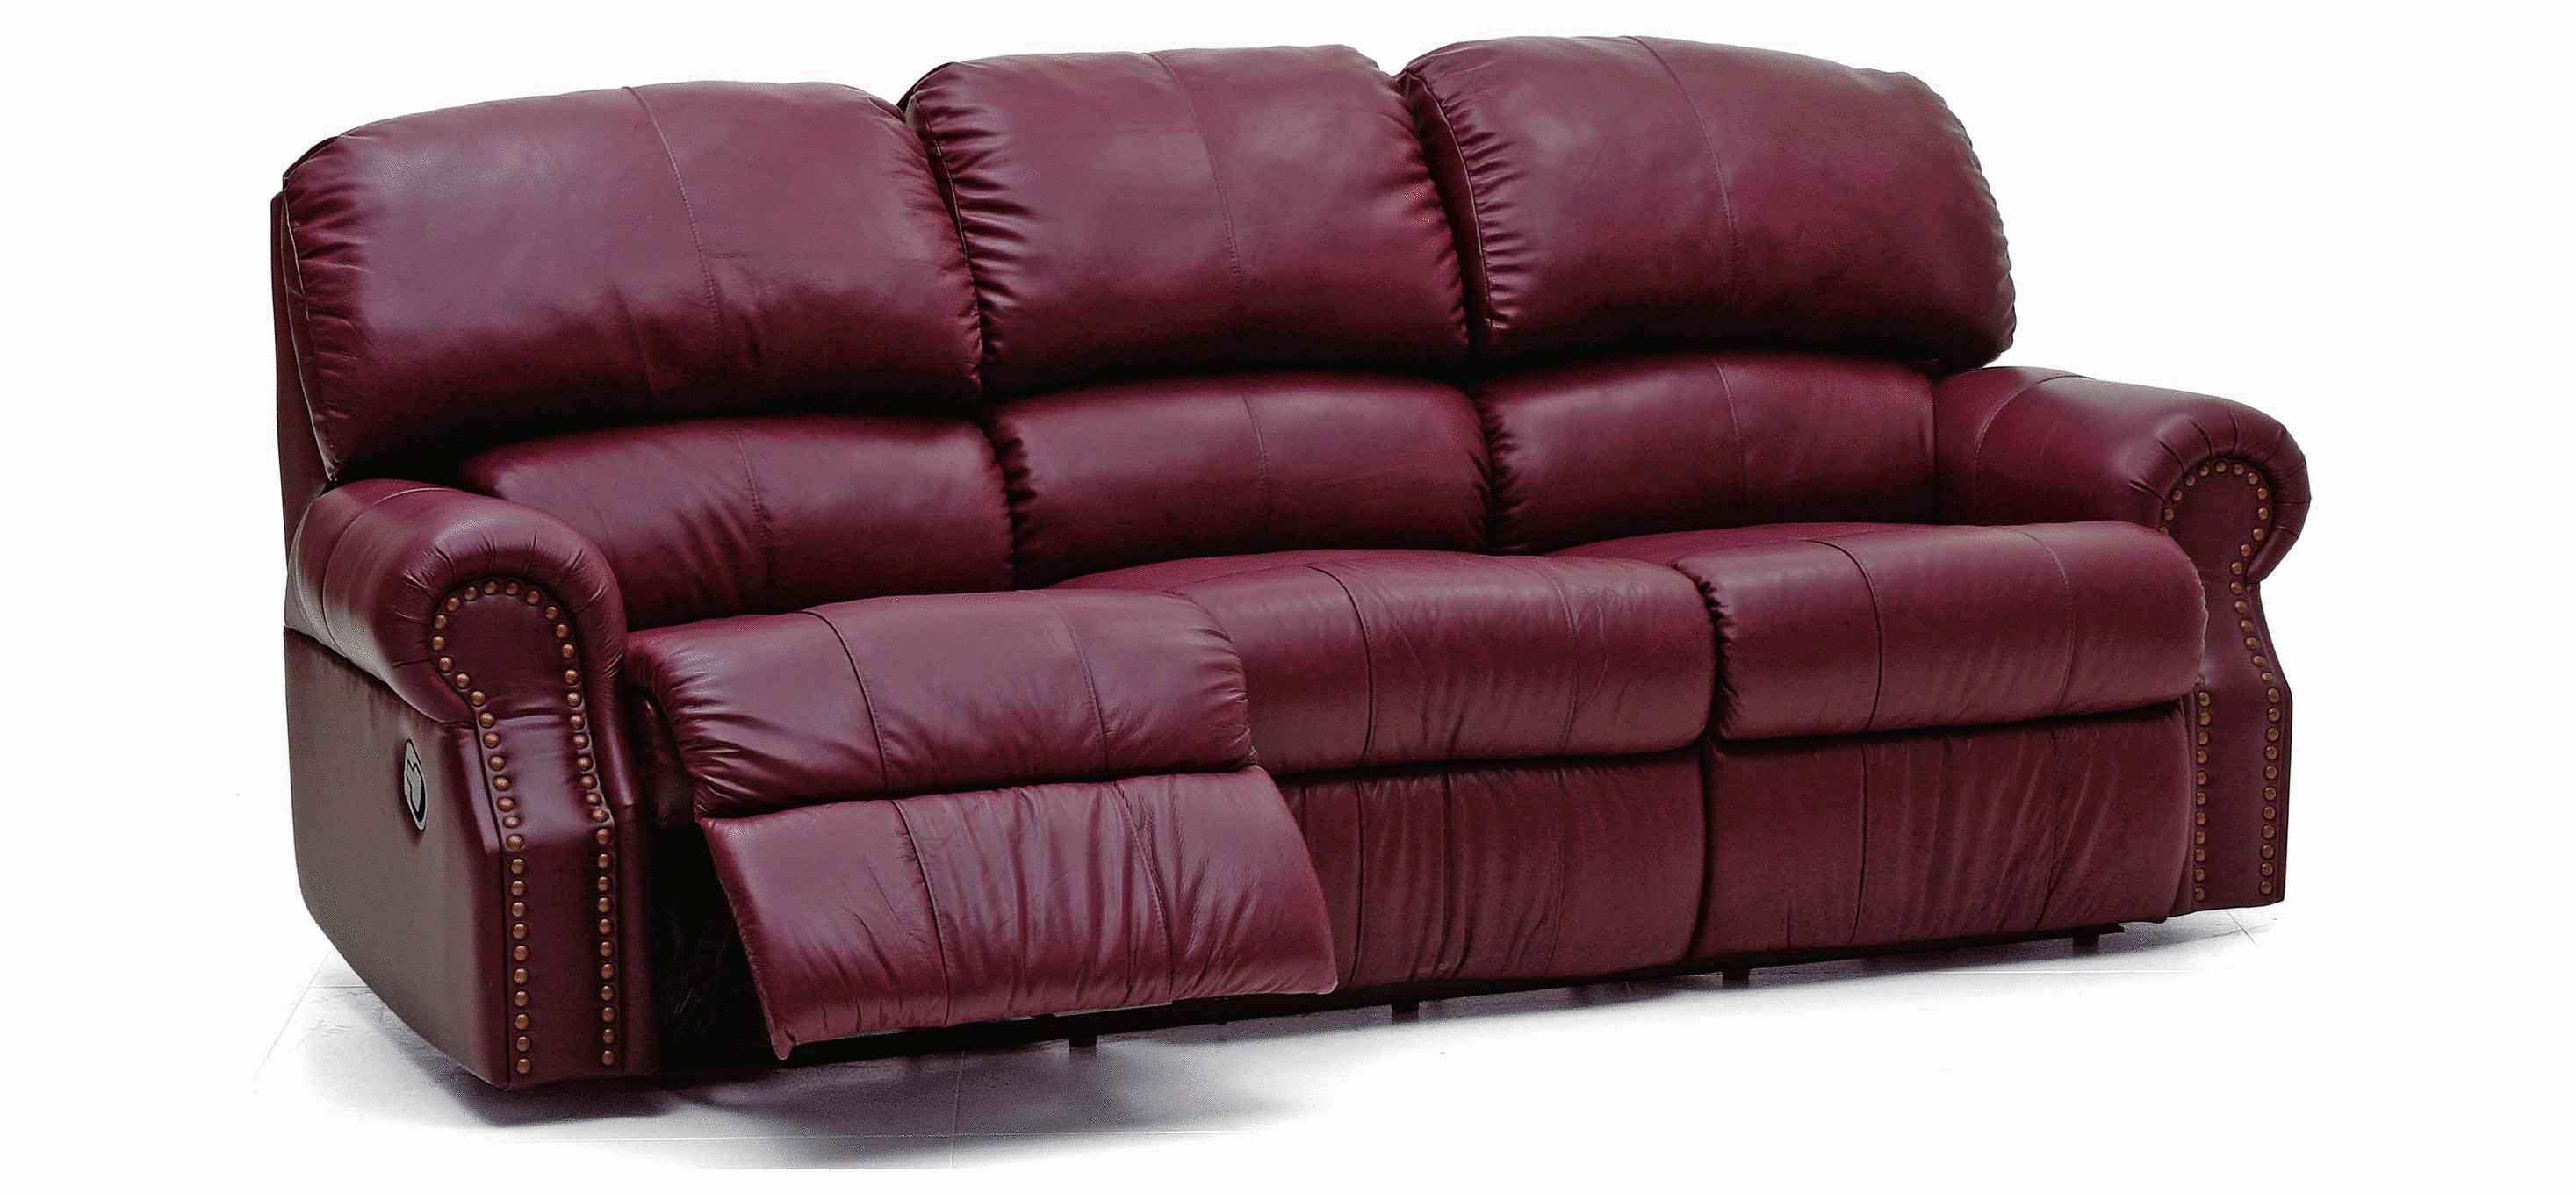 Berkline Reclining Sofa Regarding Berkline Sofa Recliner (#4 of 12)